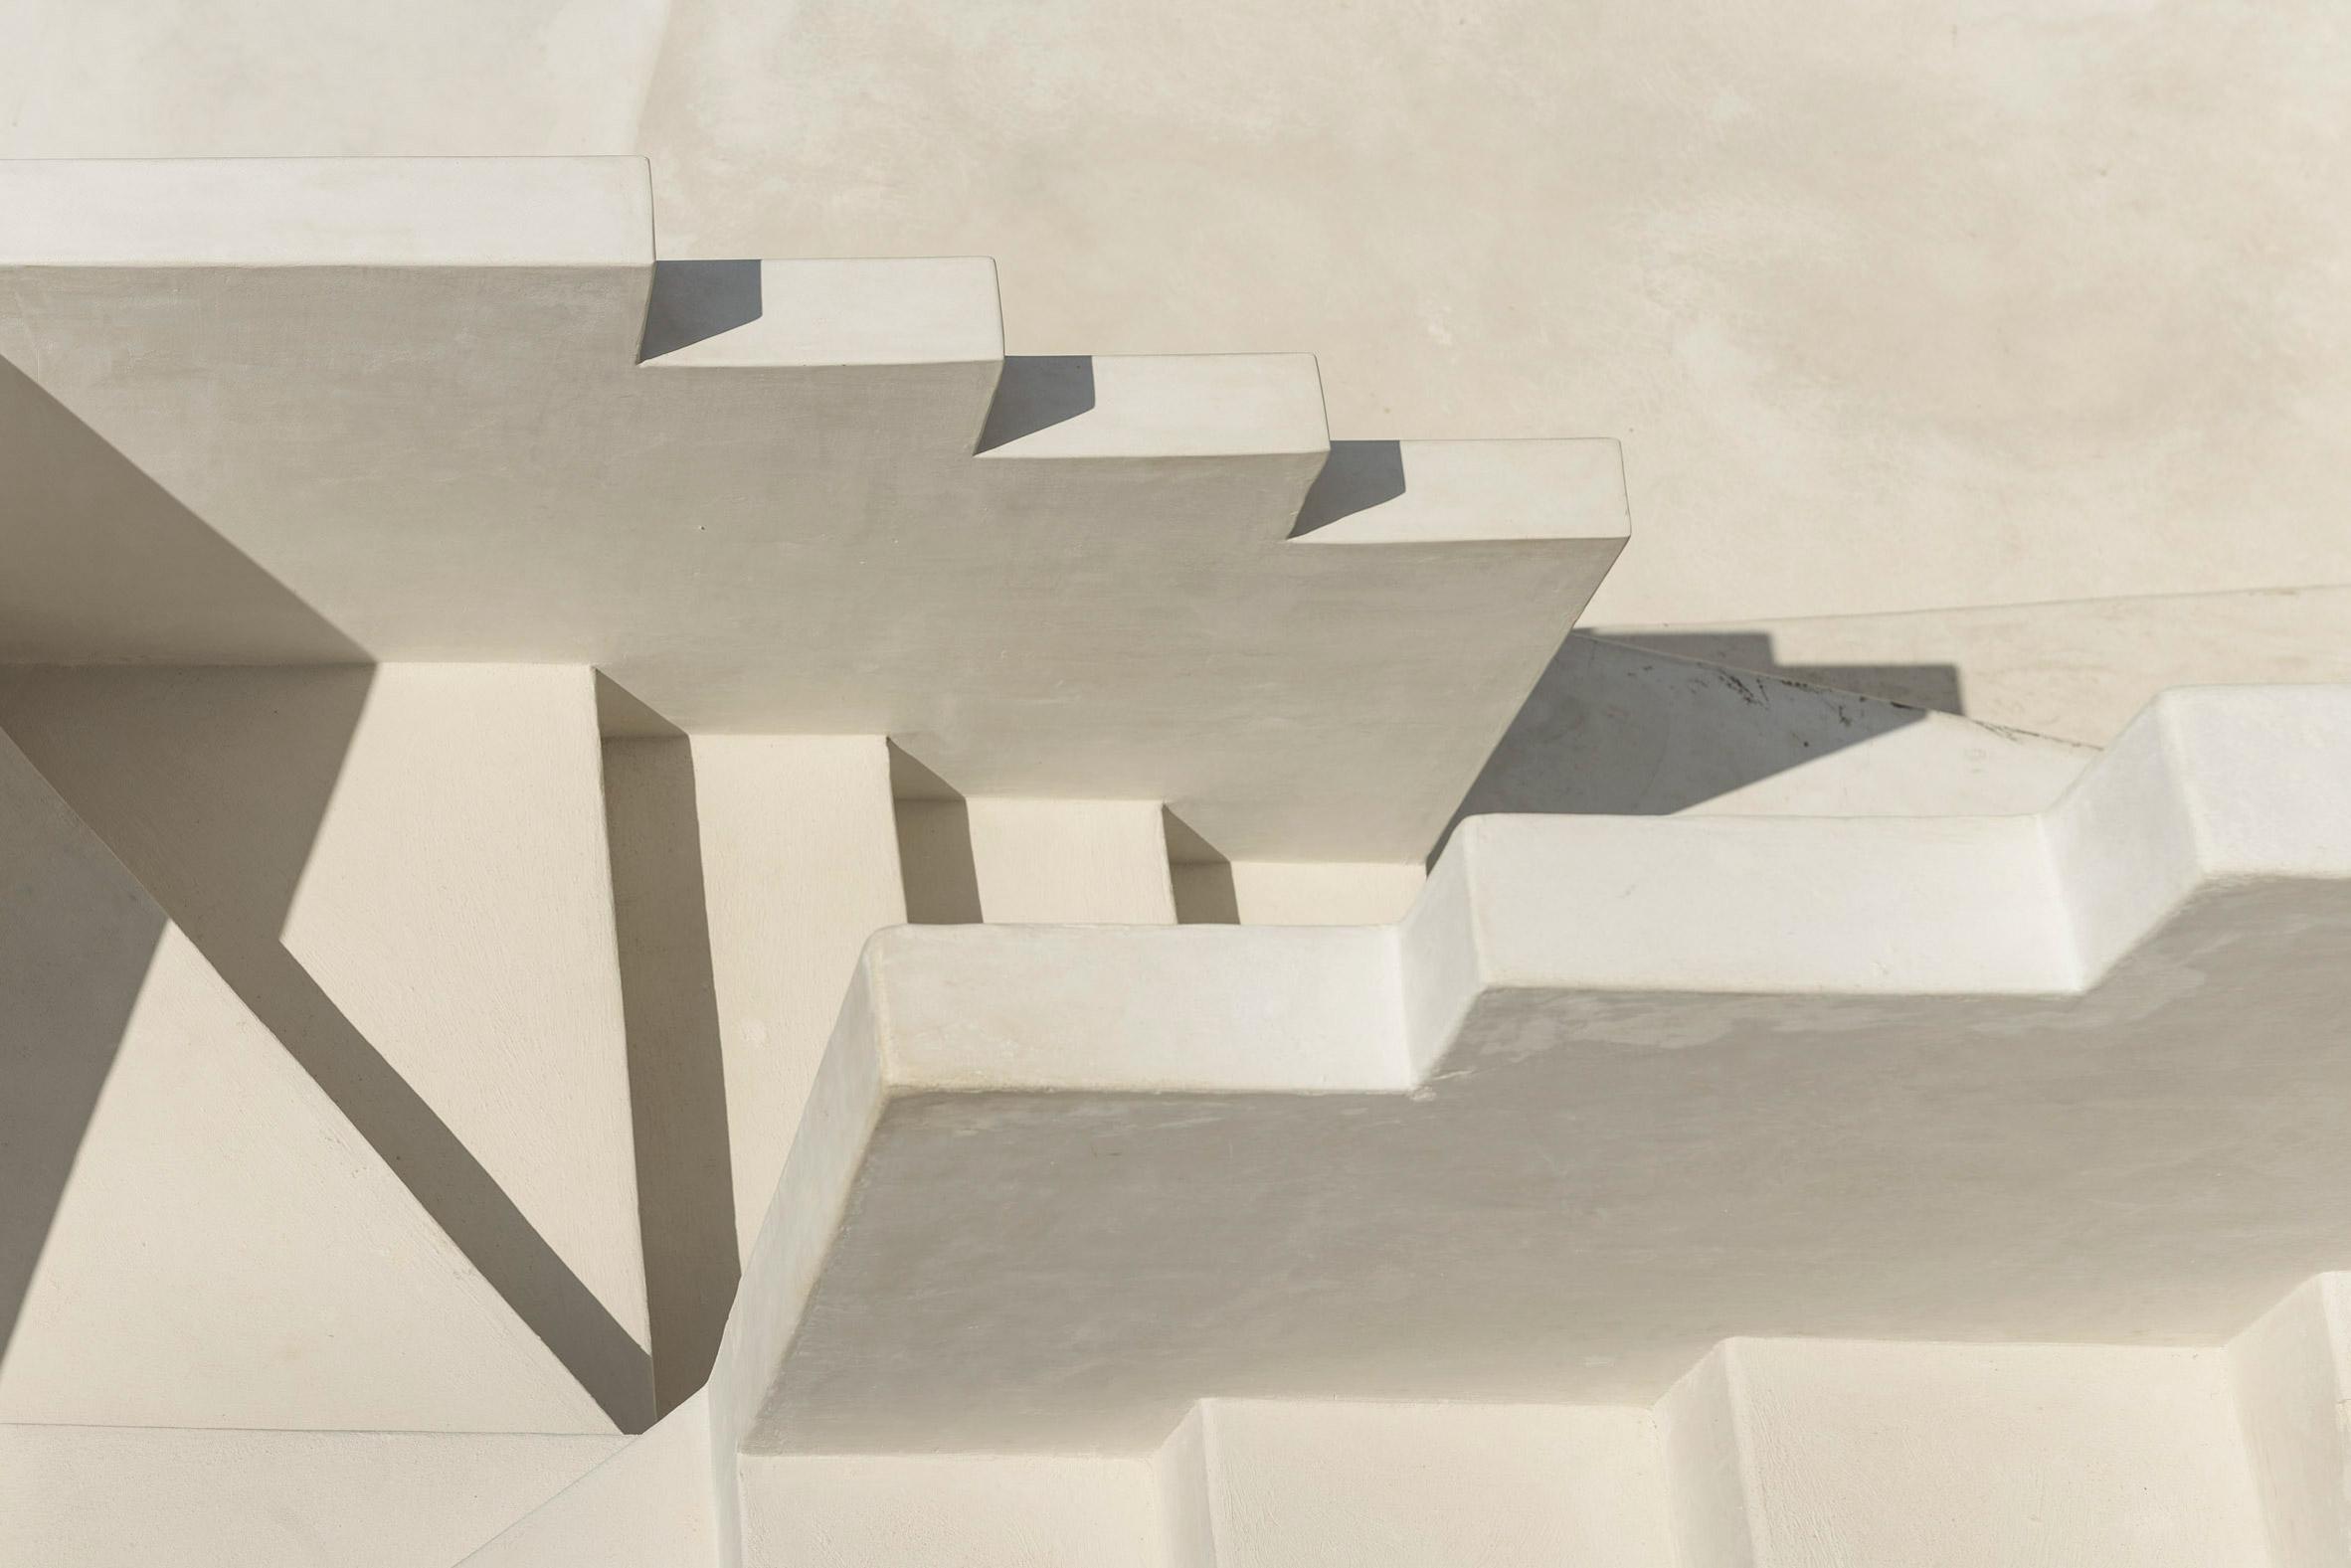 tulum-treehouse-colab-studio_dezeen_2364_col_50.jpg